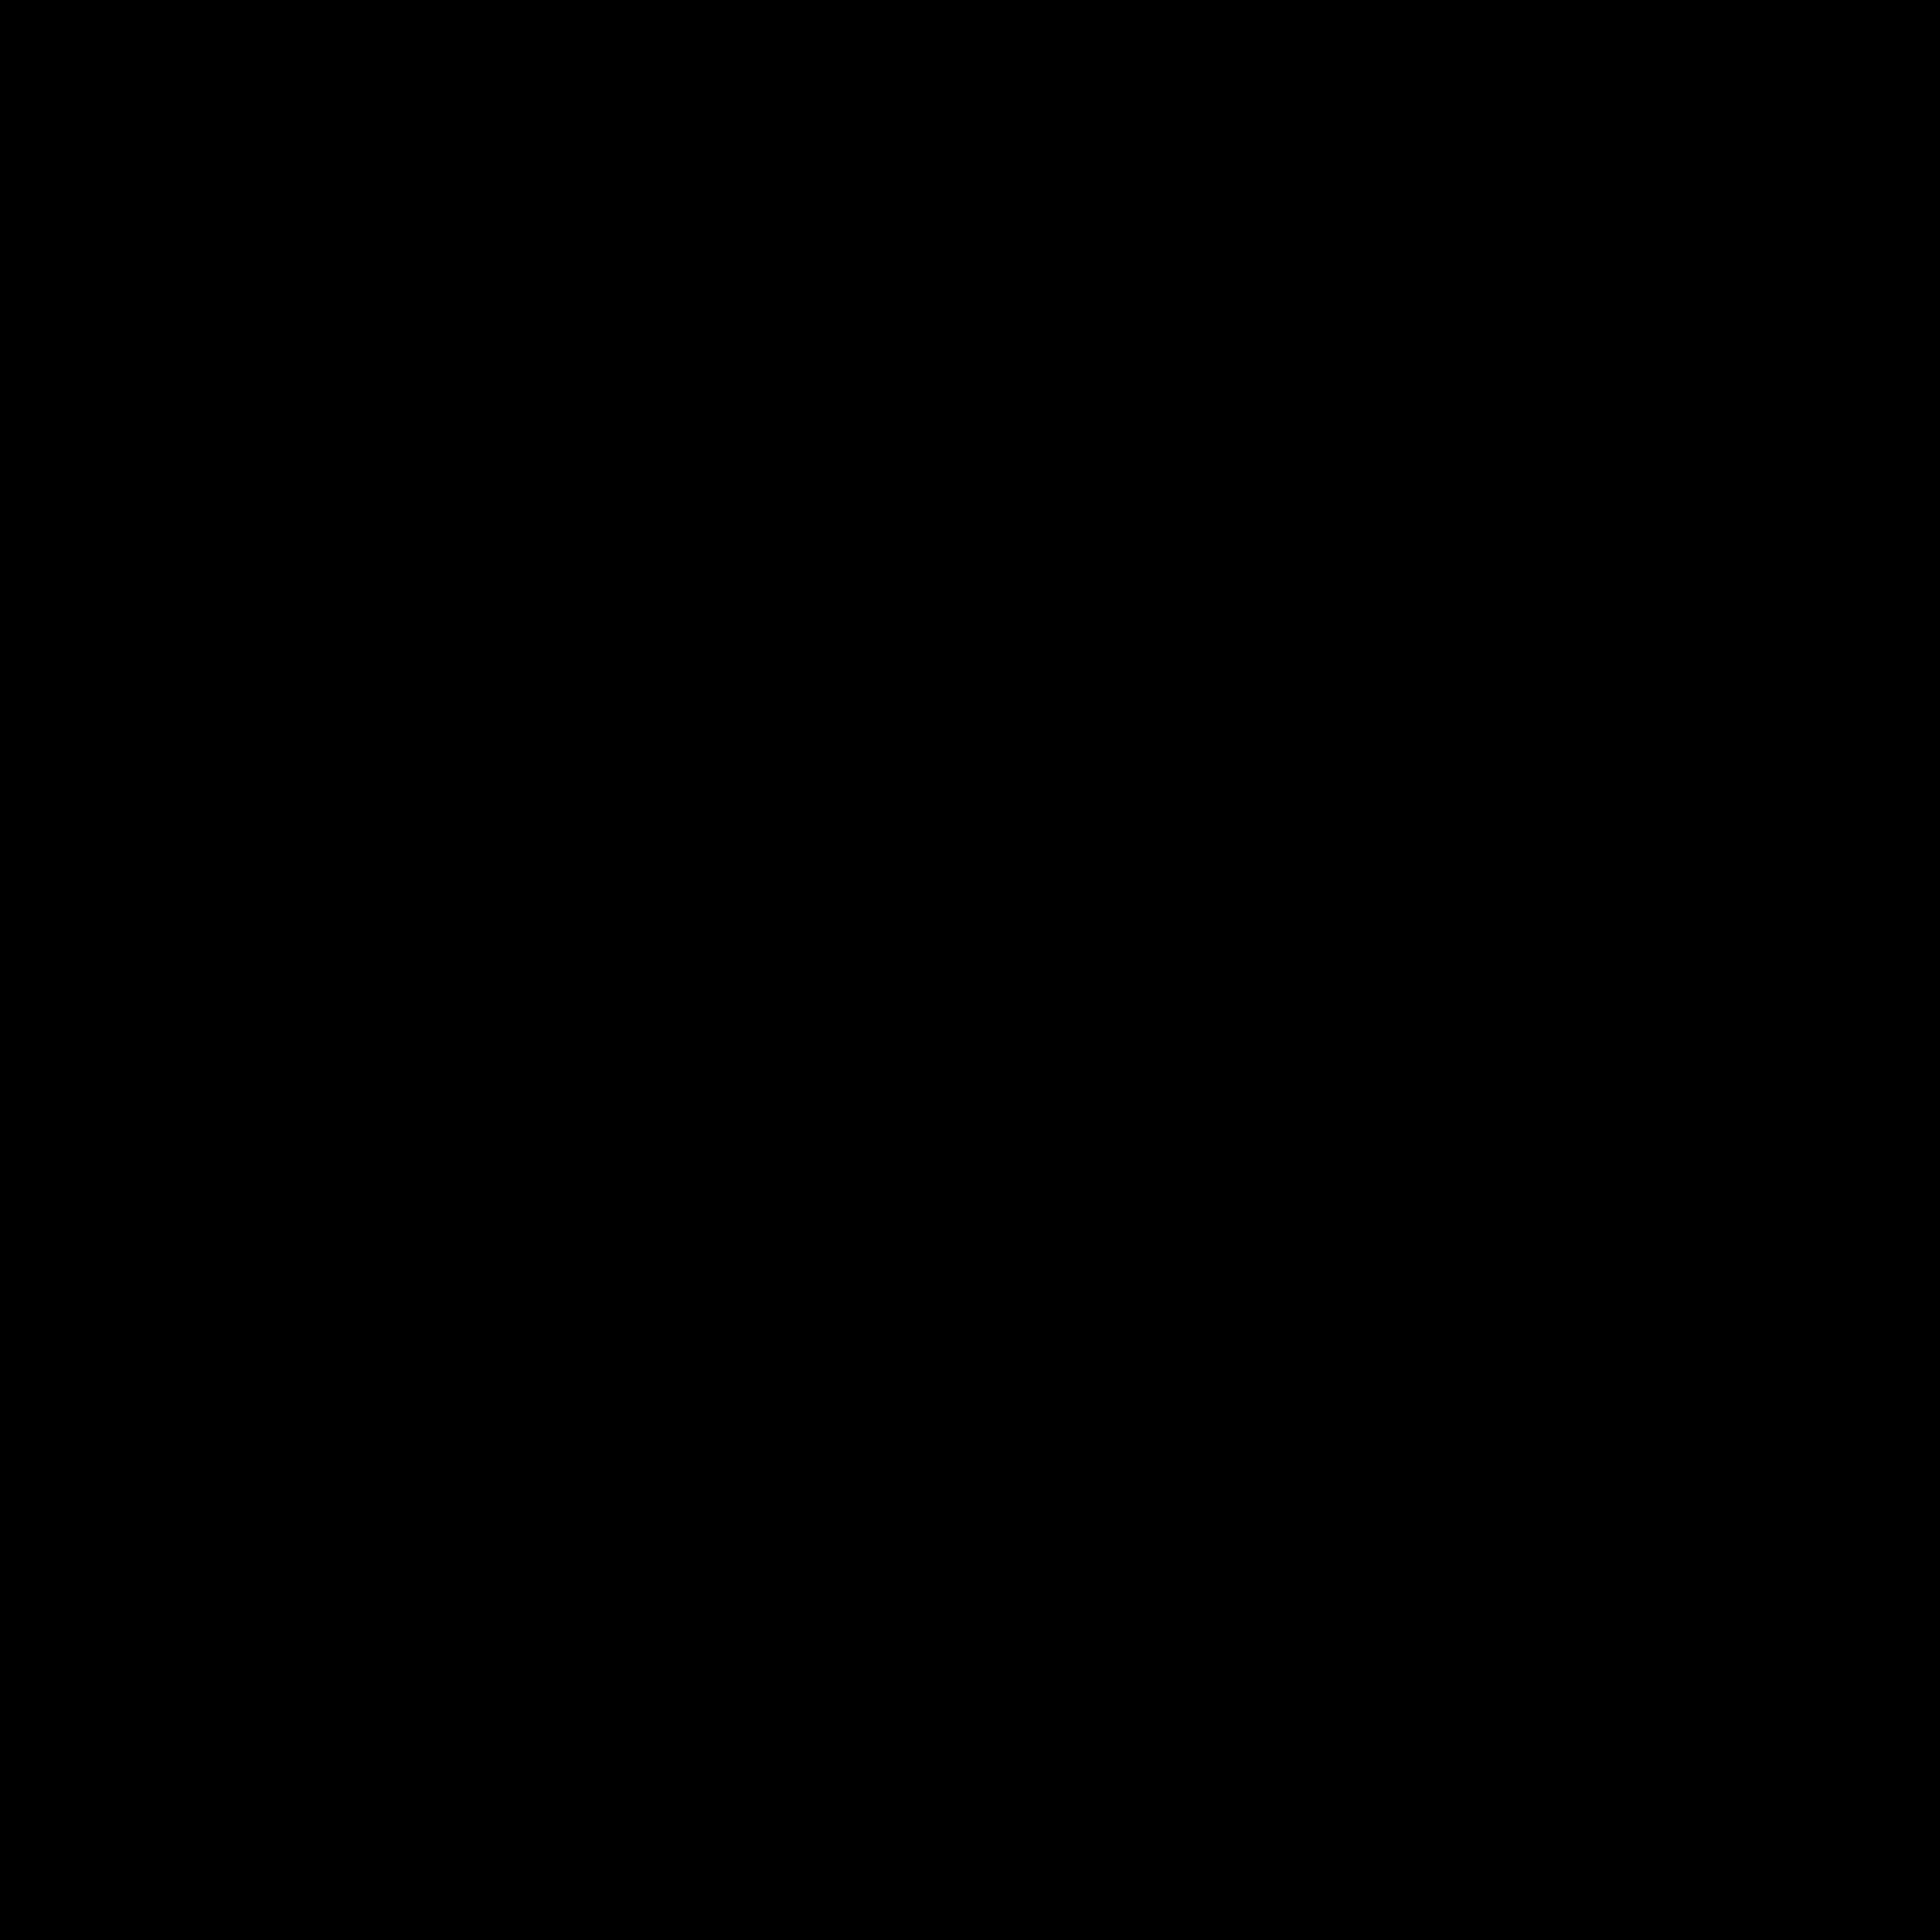 xp investimentos logo 0 - XP Investimentos Logo